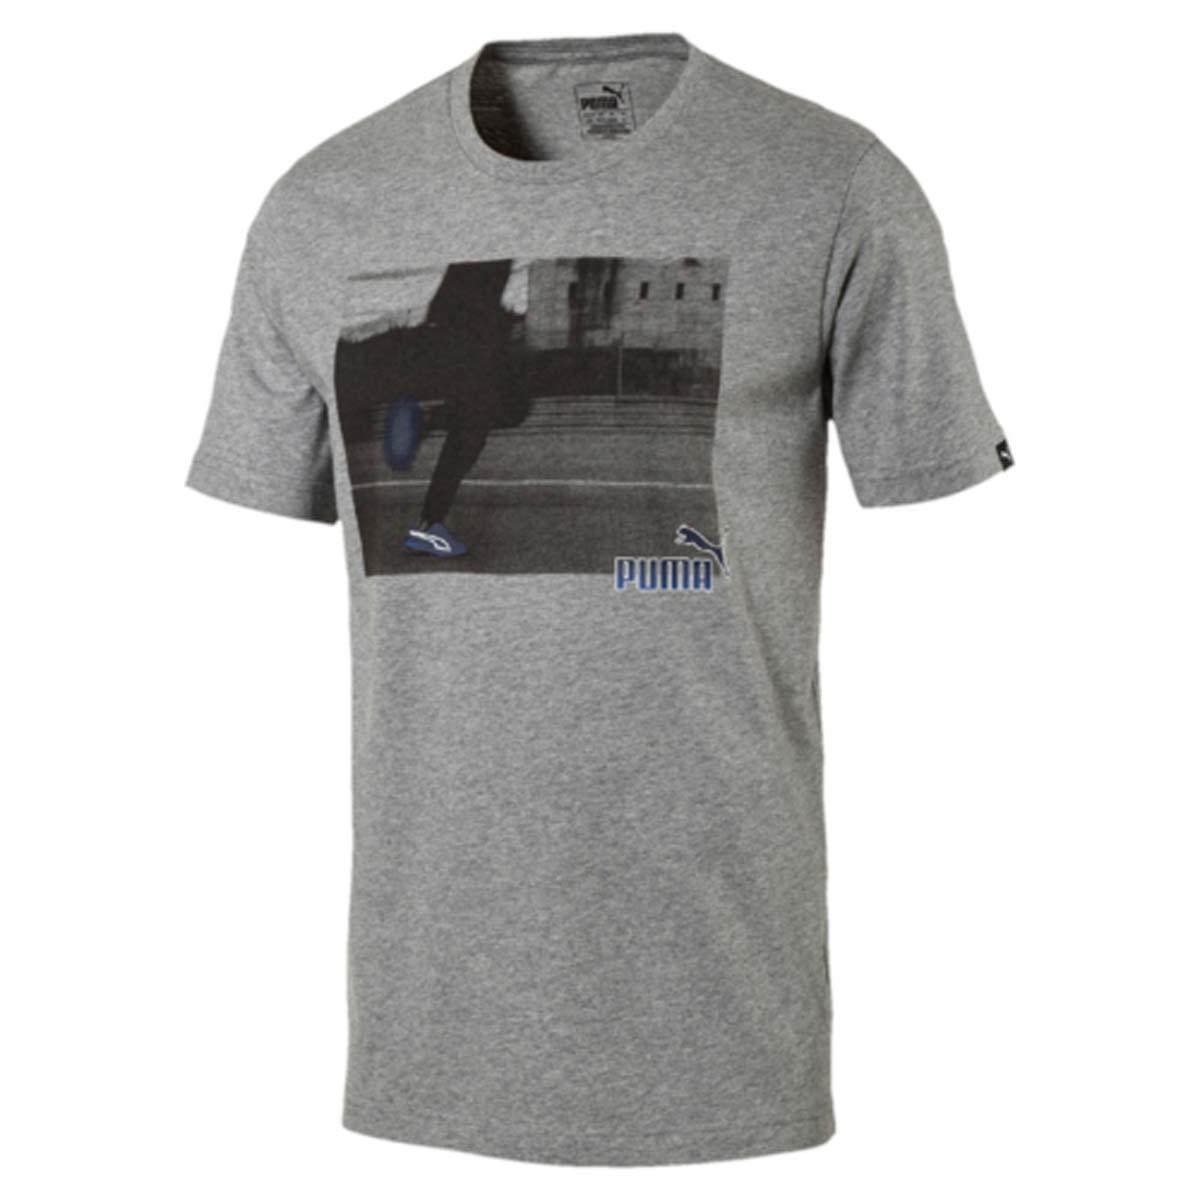 Футболка мужская Puma Explosive Photoprint Tee, цвет: серый. 590936_03. Размер XXL (52/54)